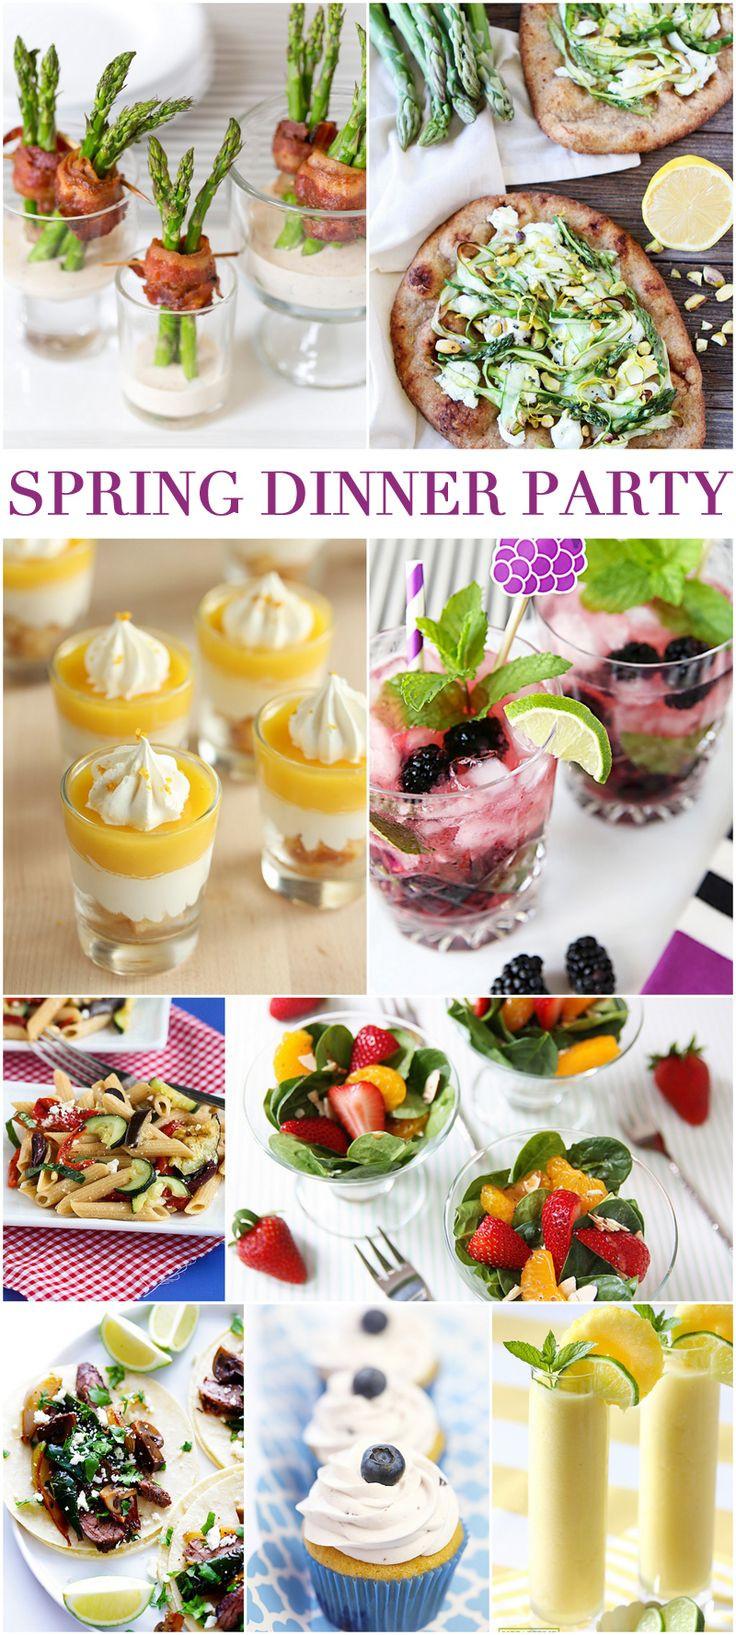 Spring Dinner Party Ideas  Best 25 Dinner themes ideas on Pinterest